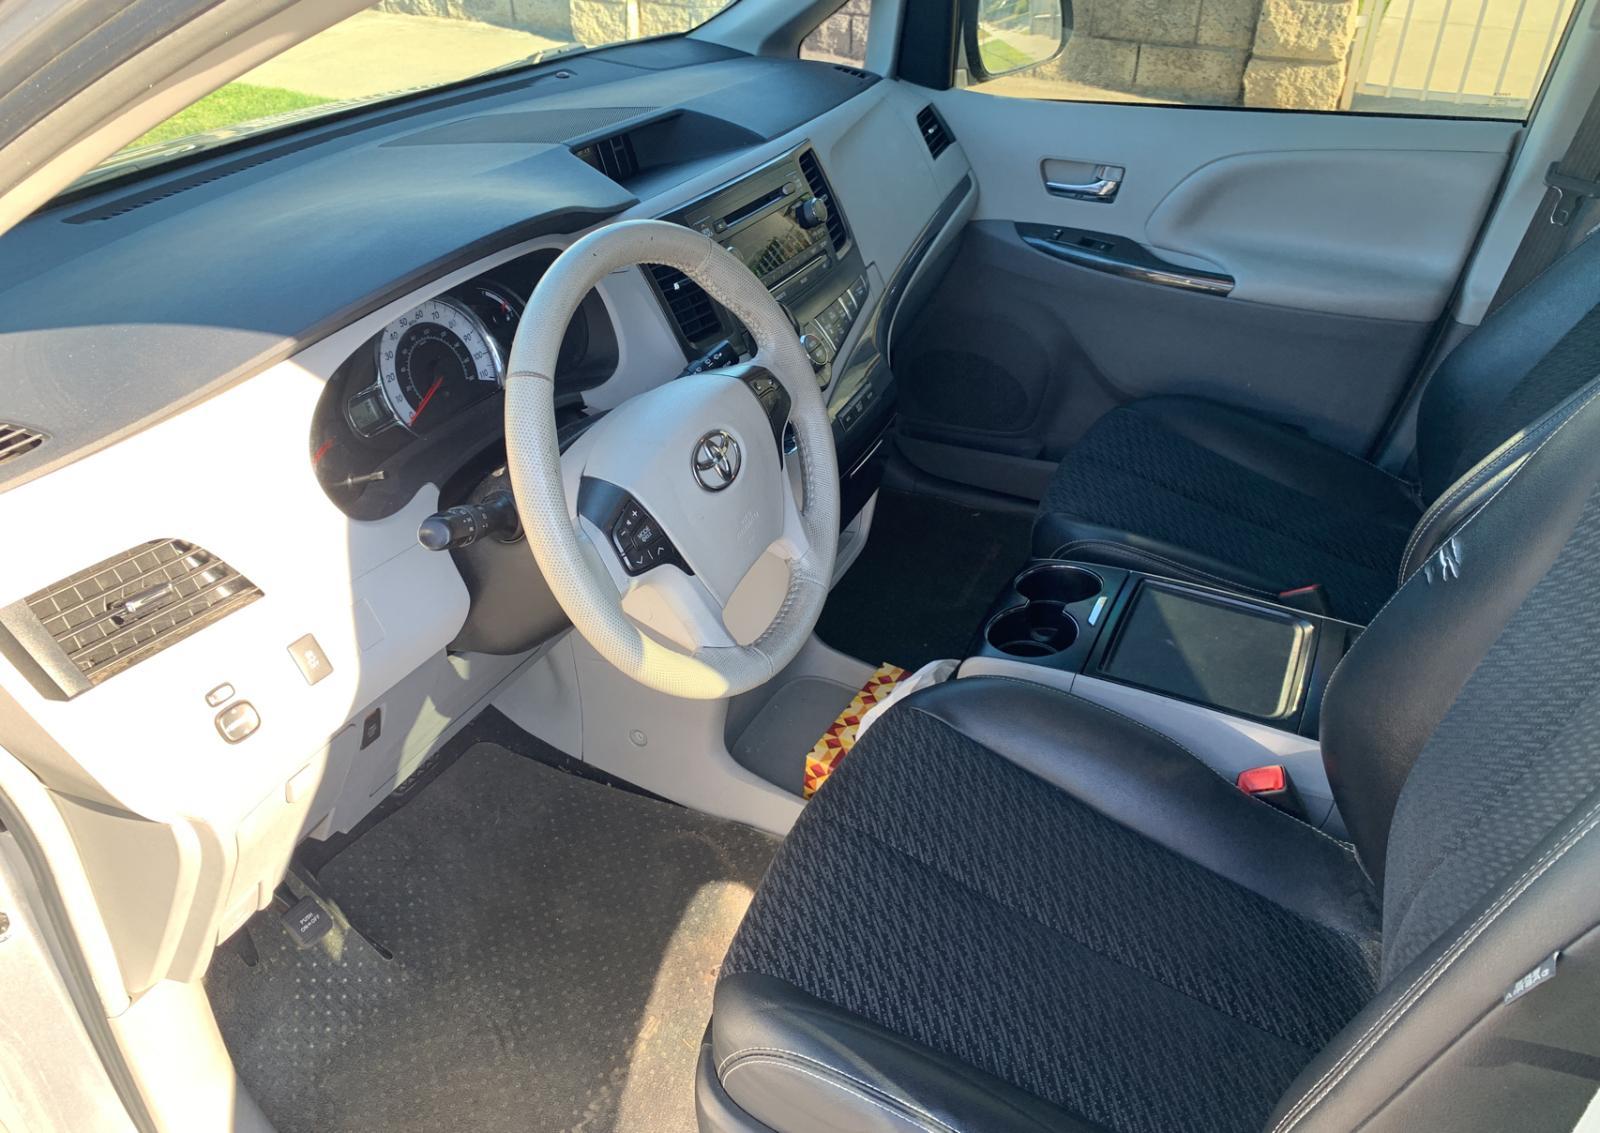 2012 Toyota Sienna Spo 3.5L engine view